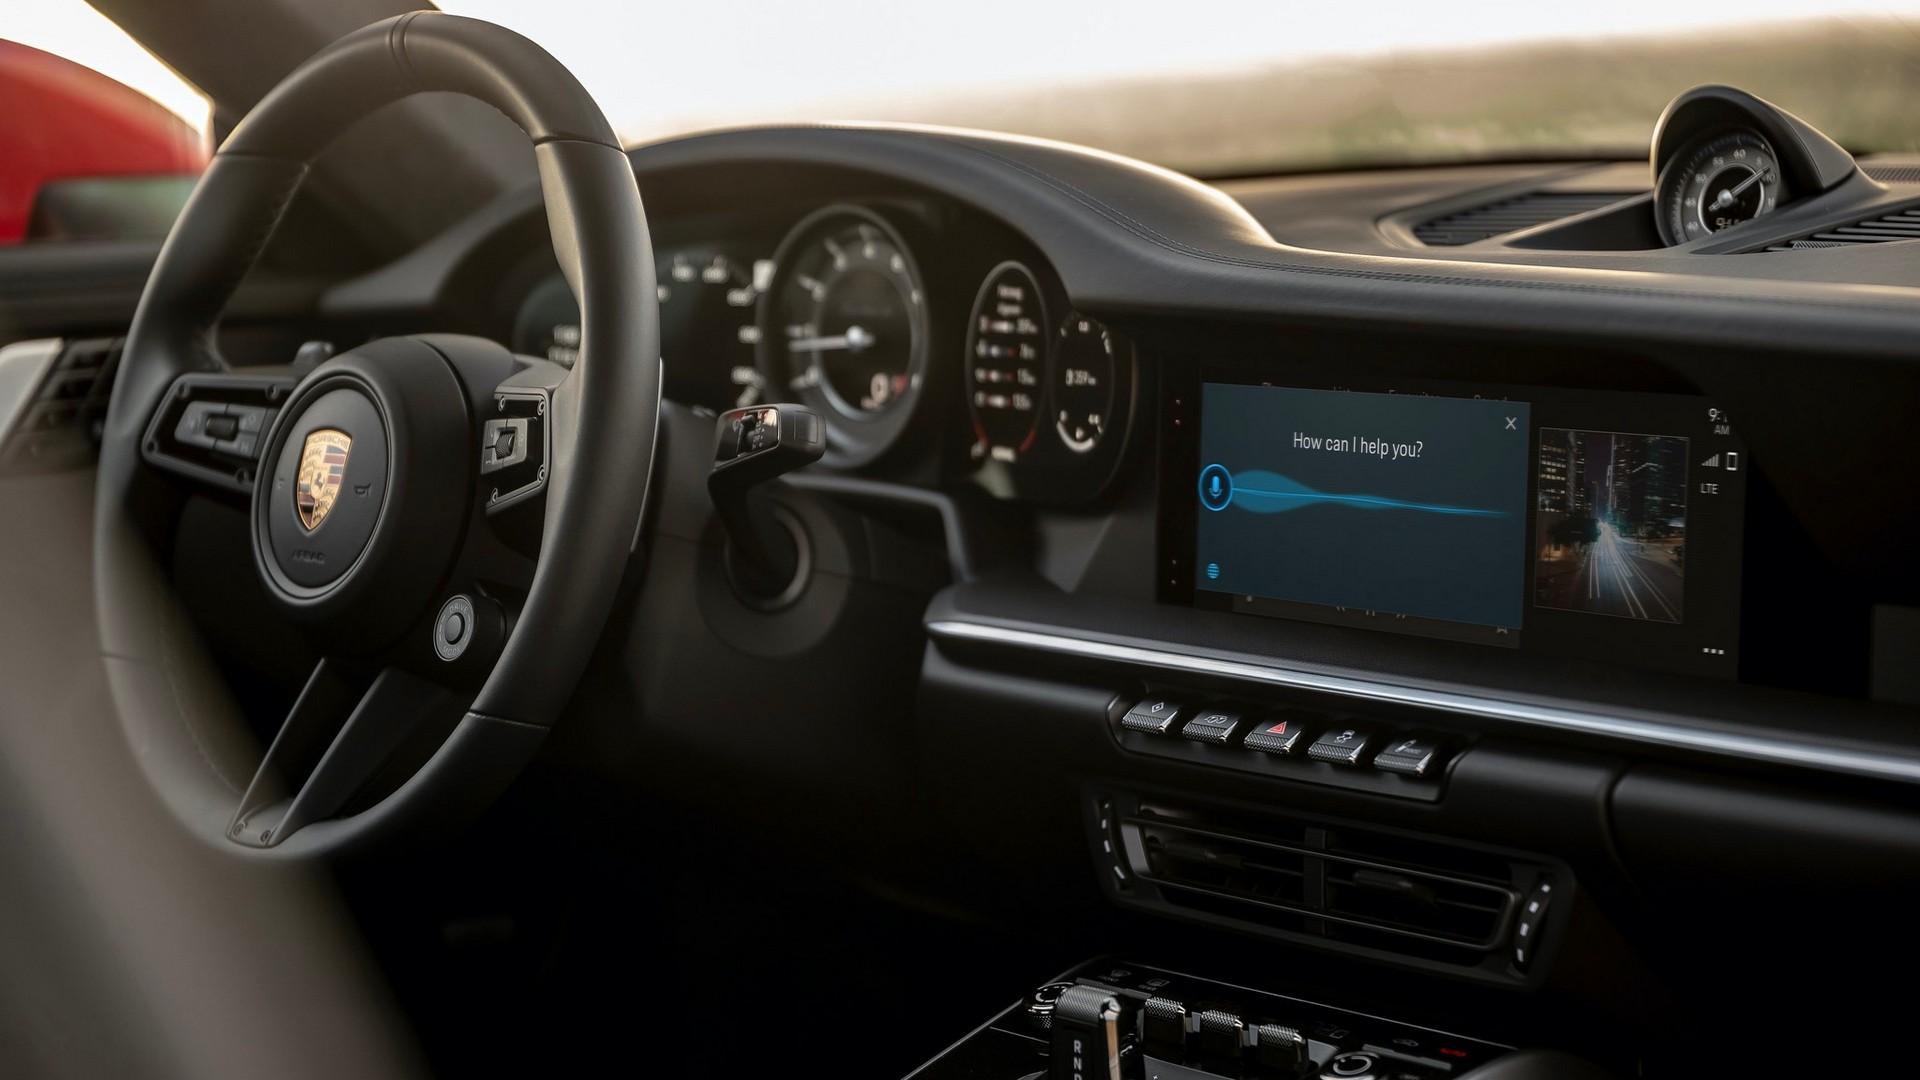 Porsche-Communication-Management-6-9